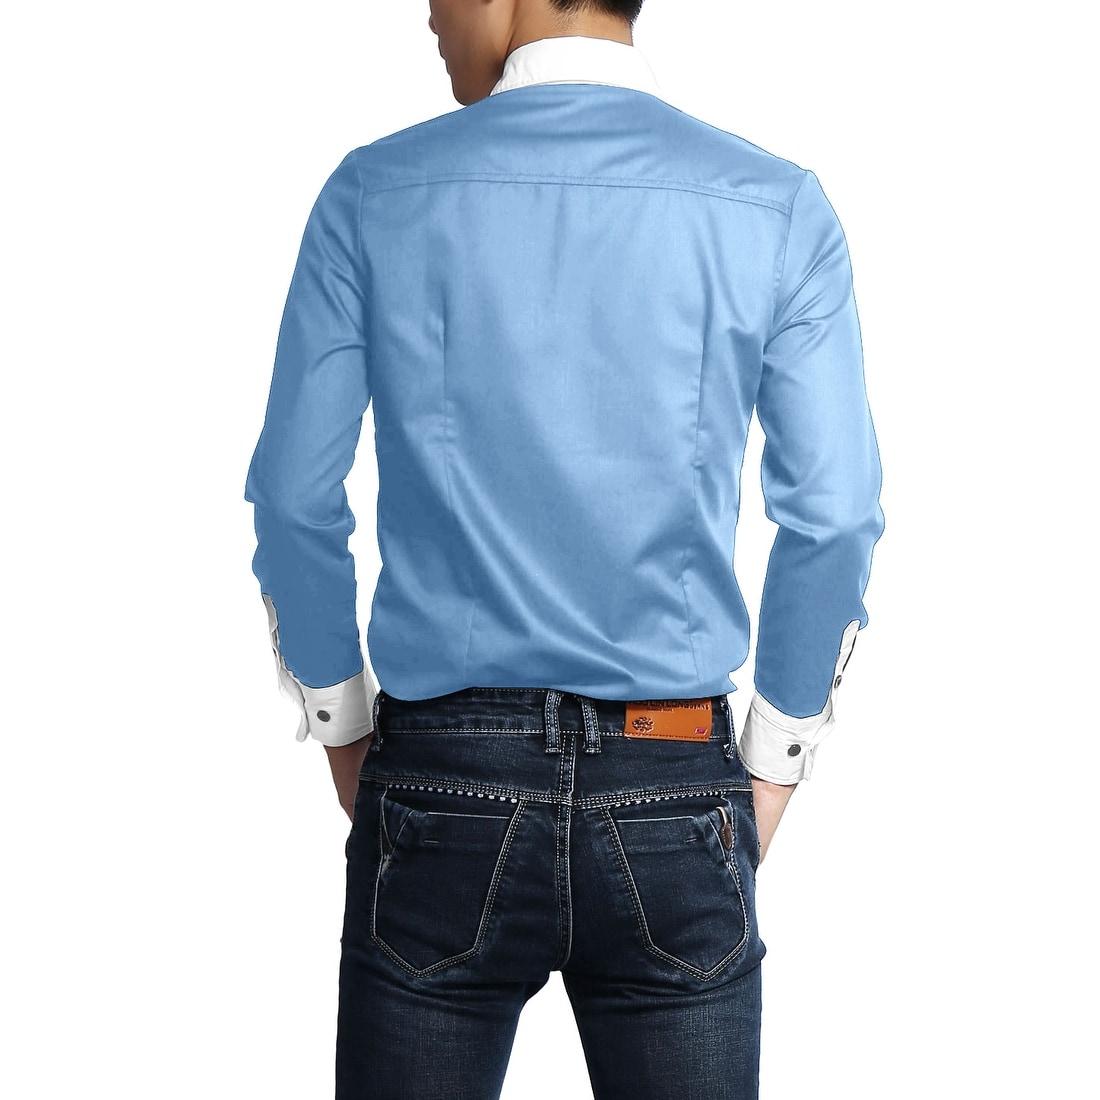 Shop Men Contrast Color Long Sleeves Slim Fit Button Up Shirt On